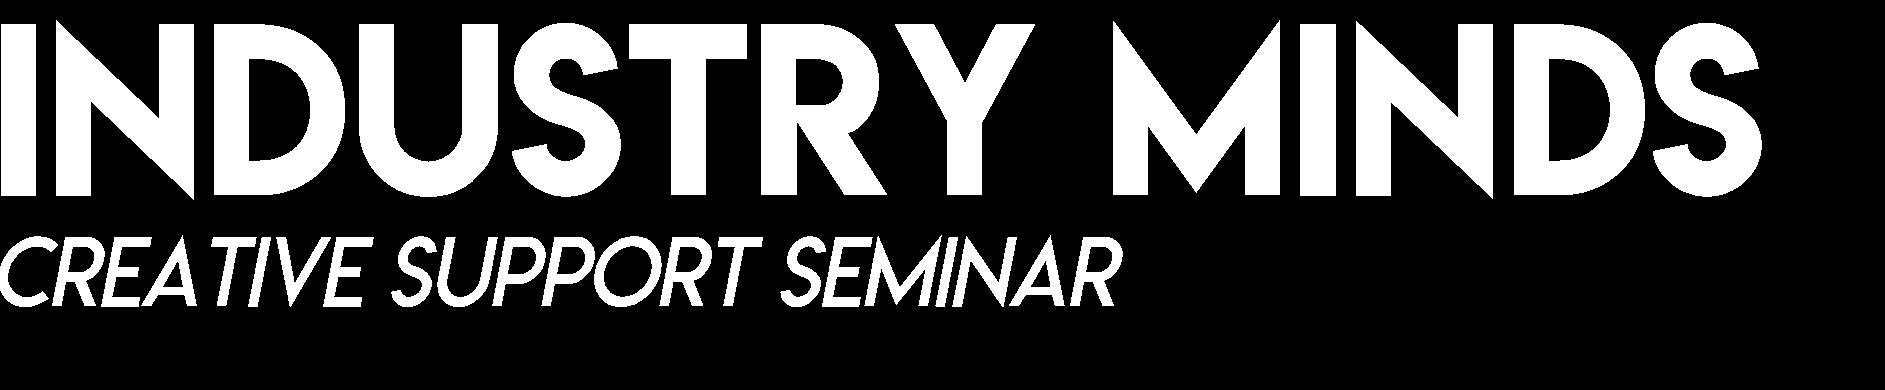 Creative Support Seminar Oct